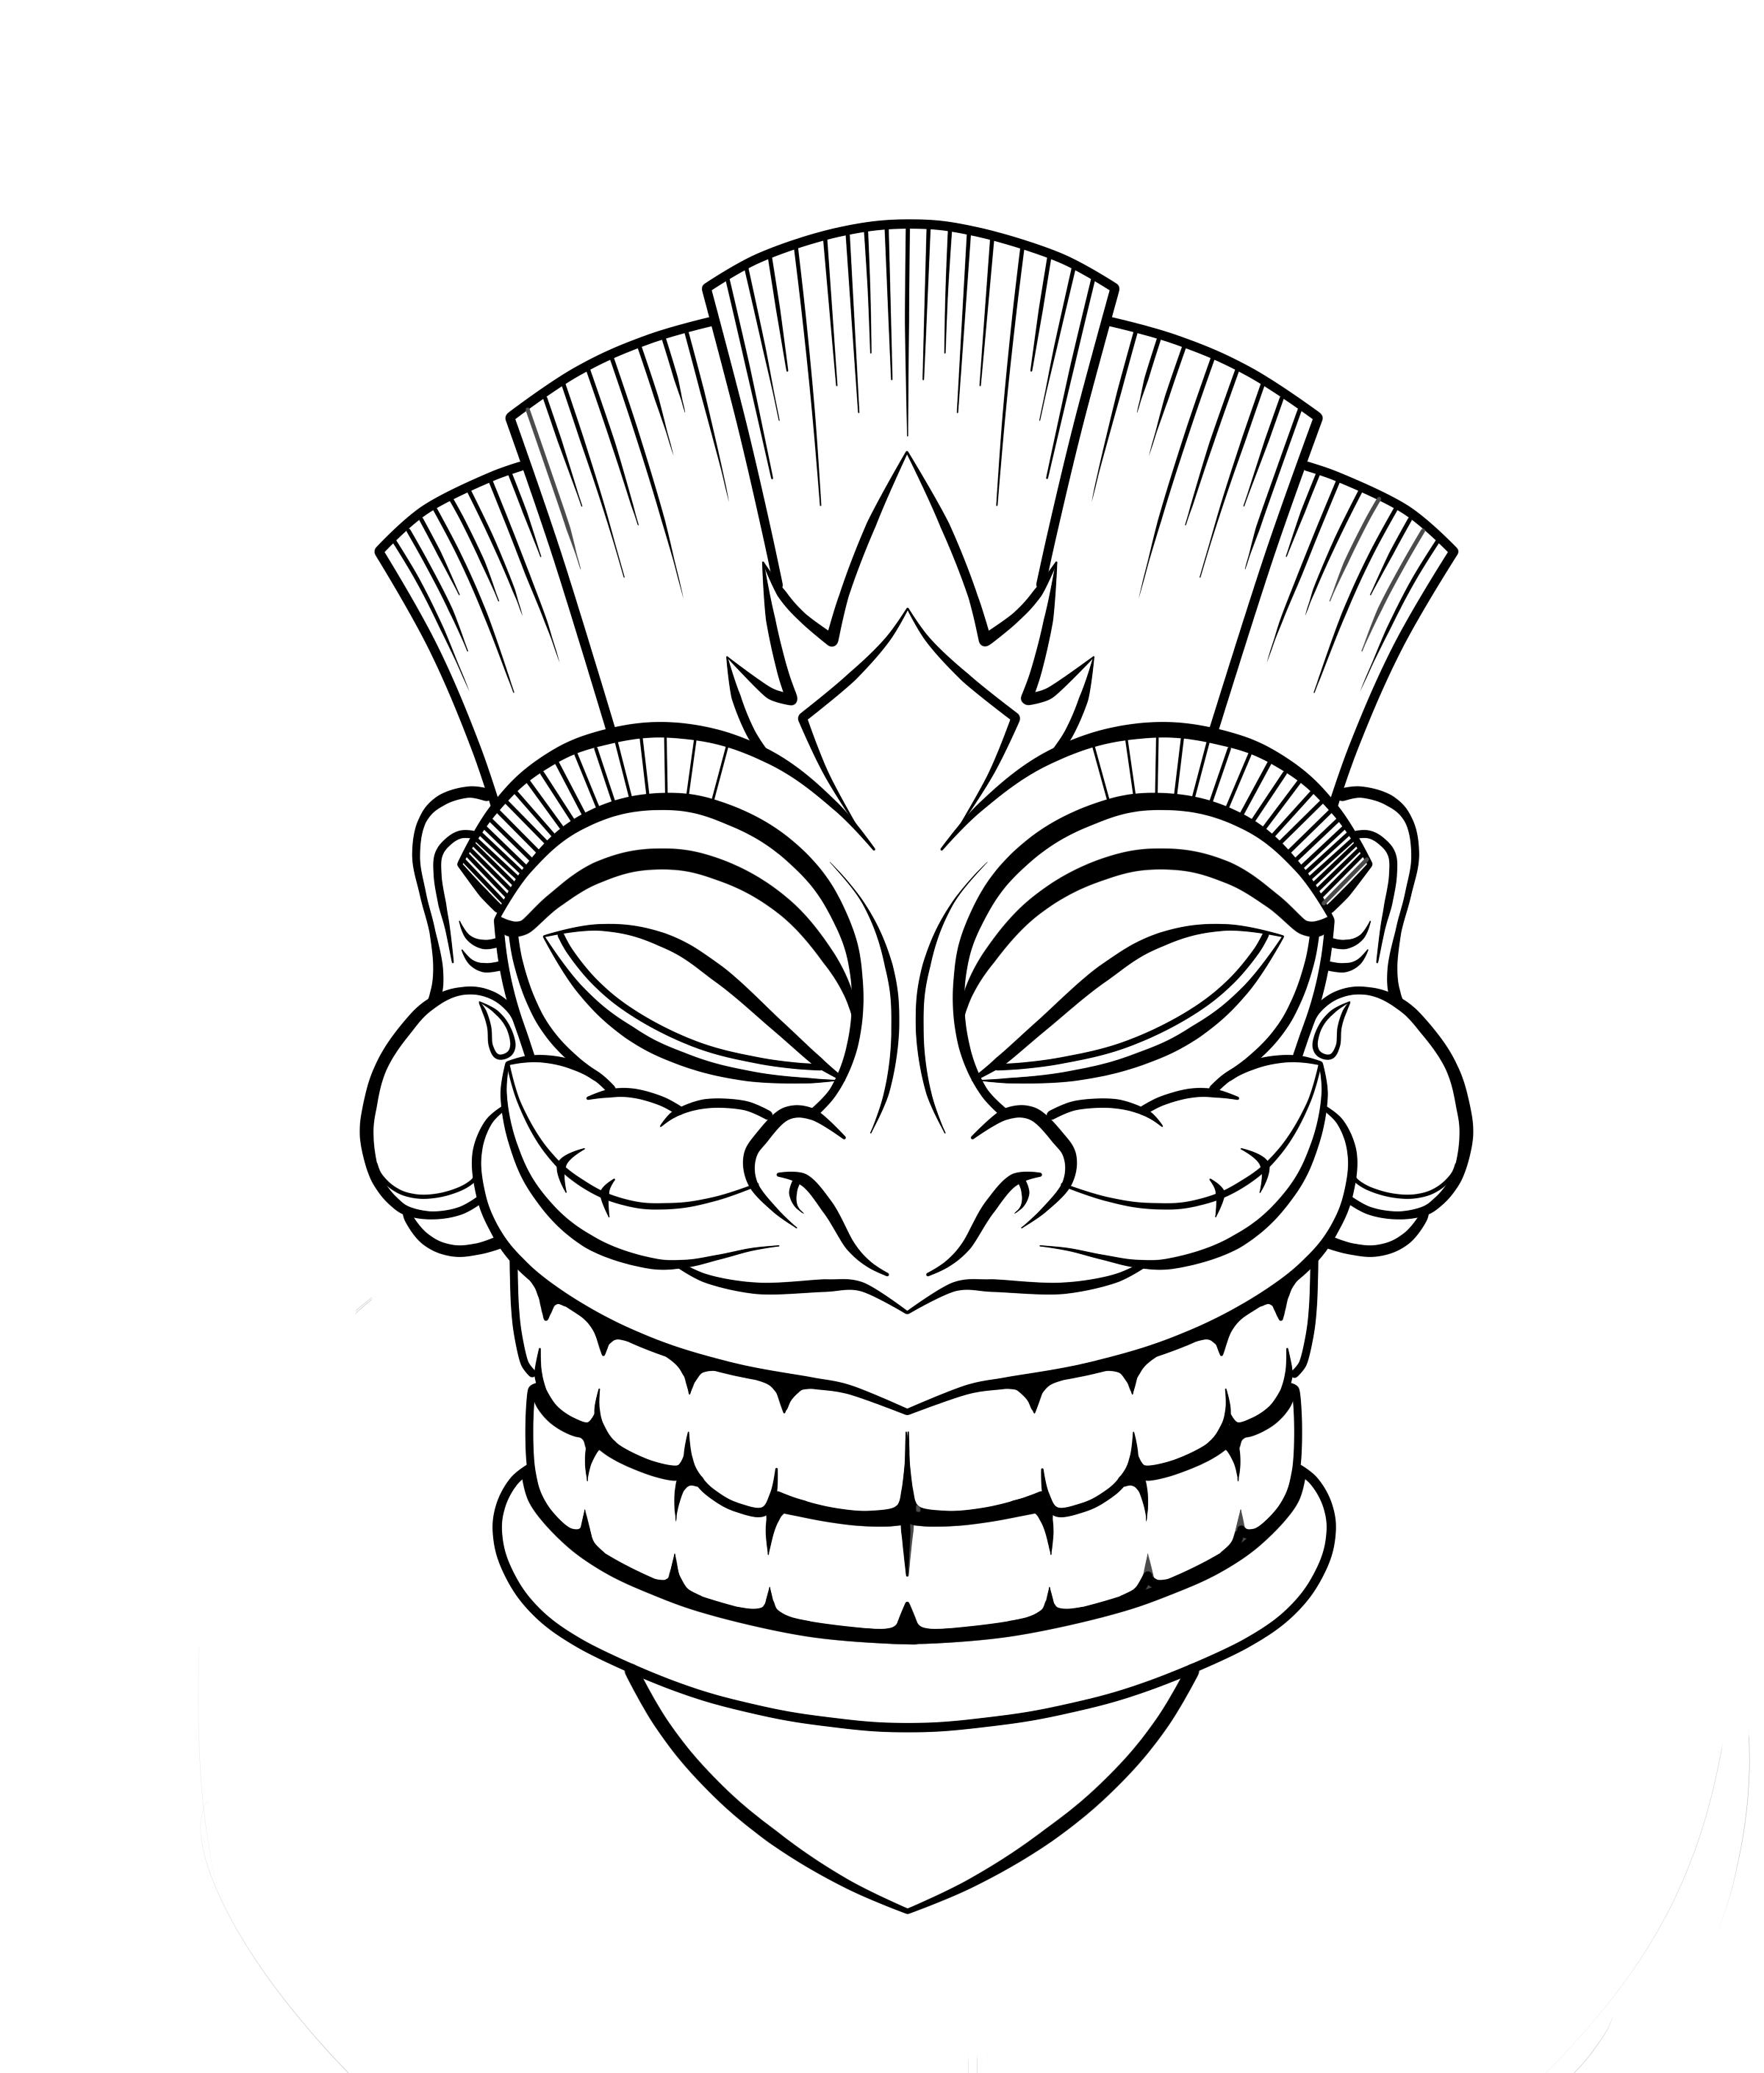 Tiki Mask Clipart - Clipart Kid